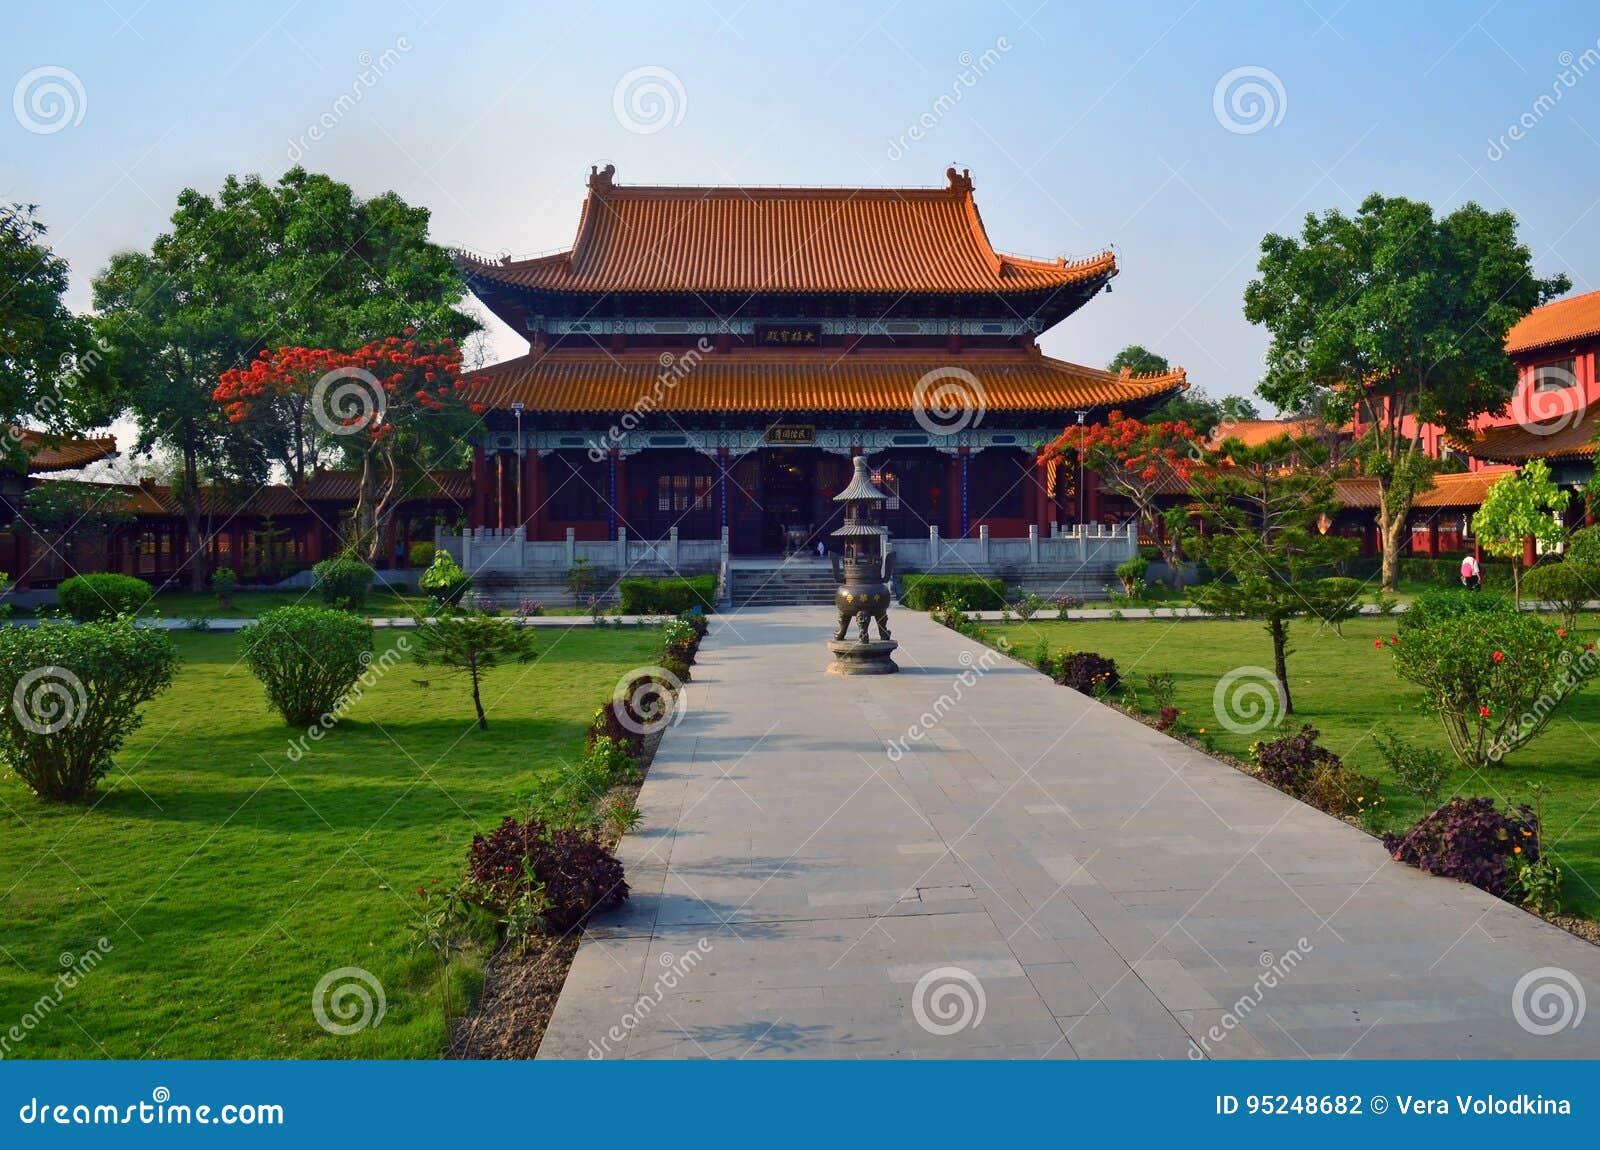 Kinesisk buddistisk tempel i Lumbini, Nepal - födelseort av Buddha